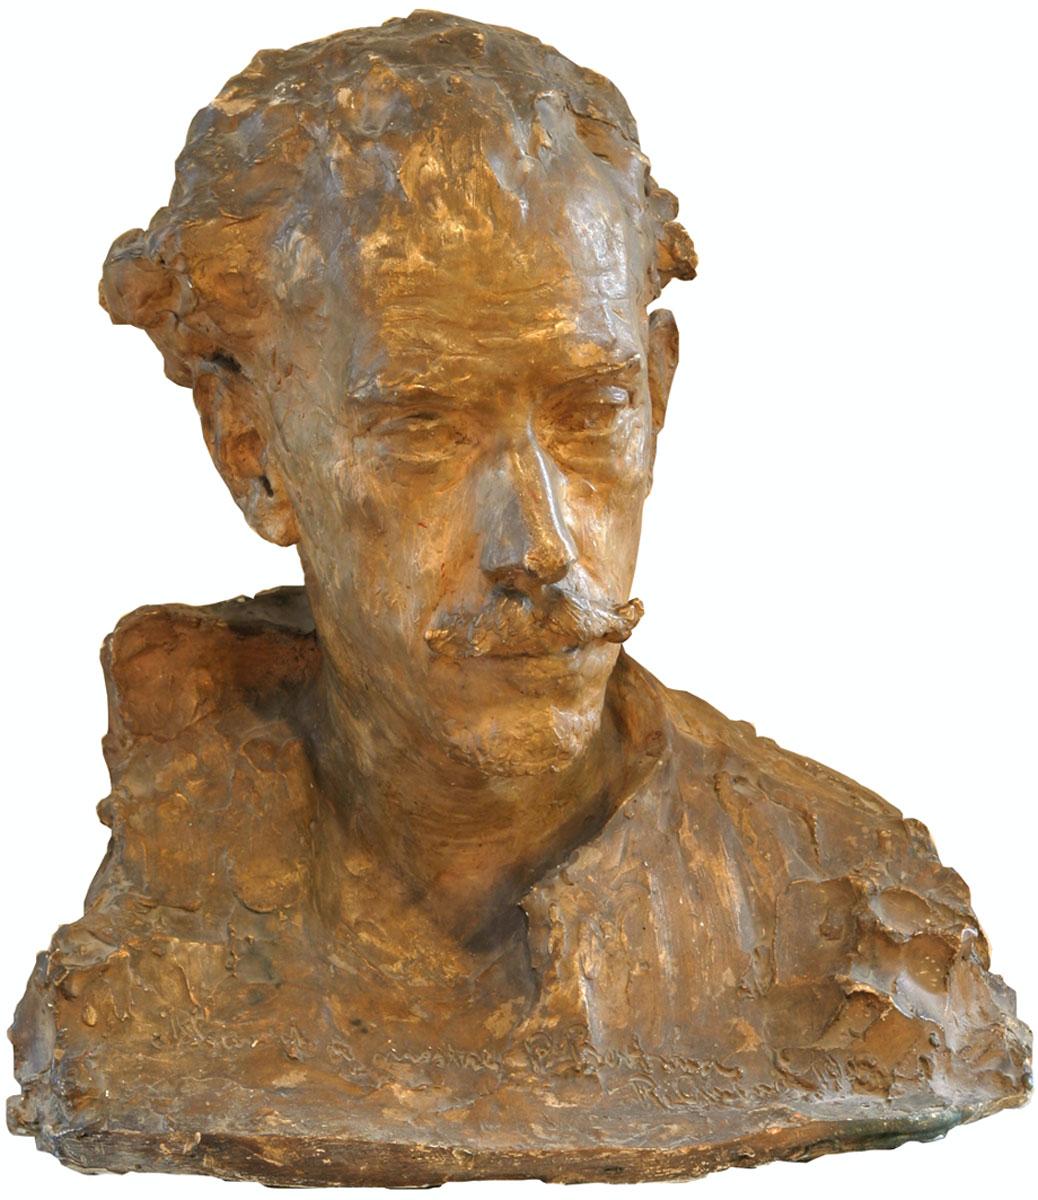 Bust de Prudenci Bertrana - Ricard Guino, c. 1910